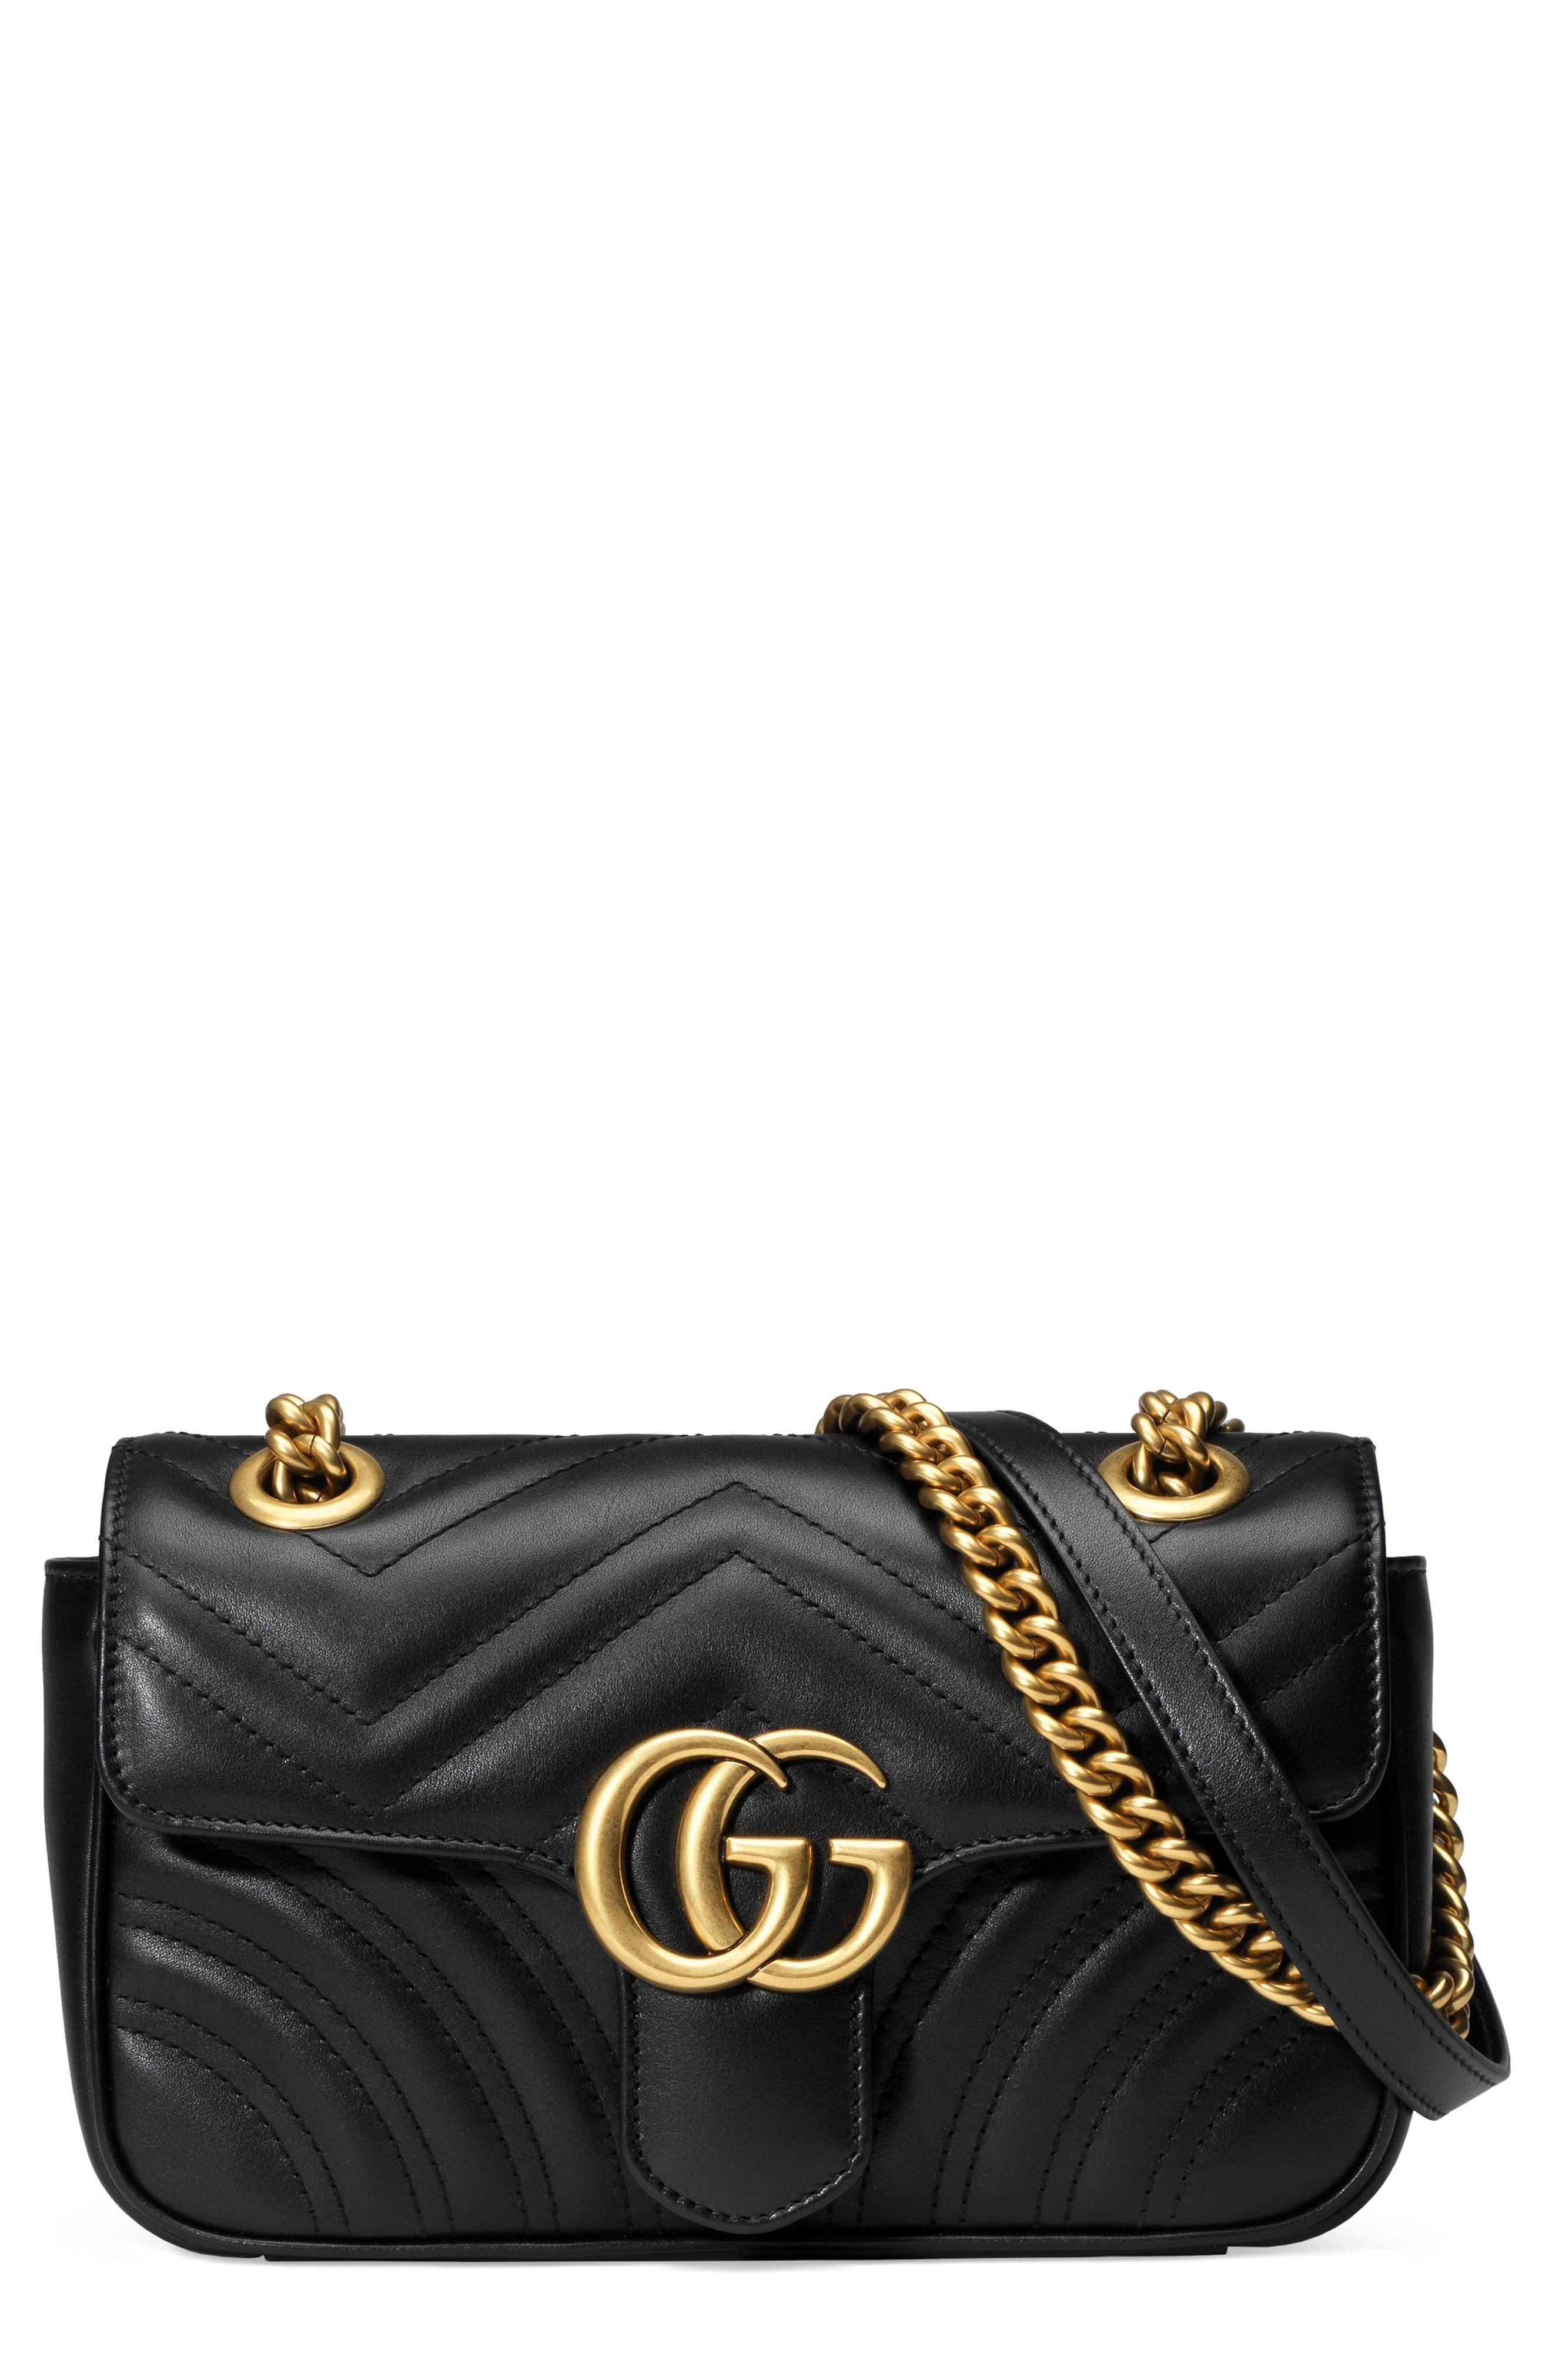 Gucci Leather Gg Marmont 2 0 Mini Matelasse Shoulder Bag